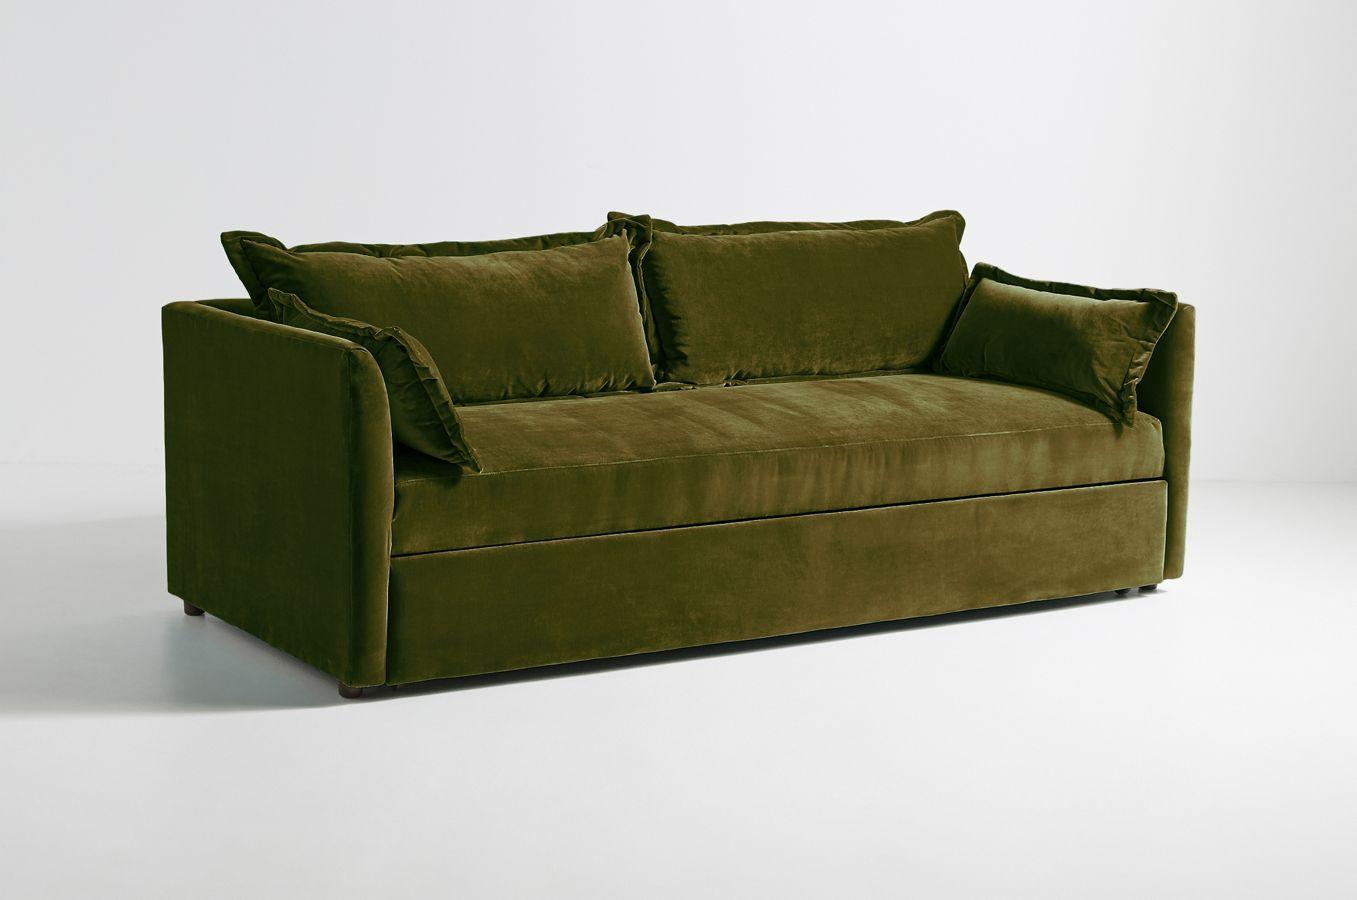 - Denver Trundle Sleeper Sofa Sleeper Sofa, Sofa, Trundle